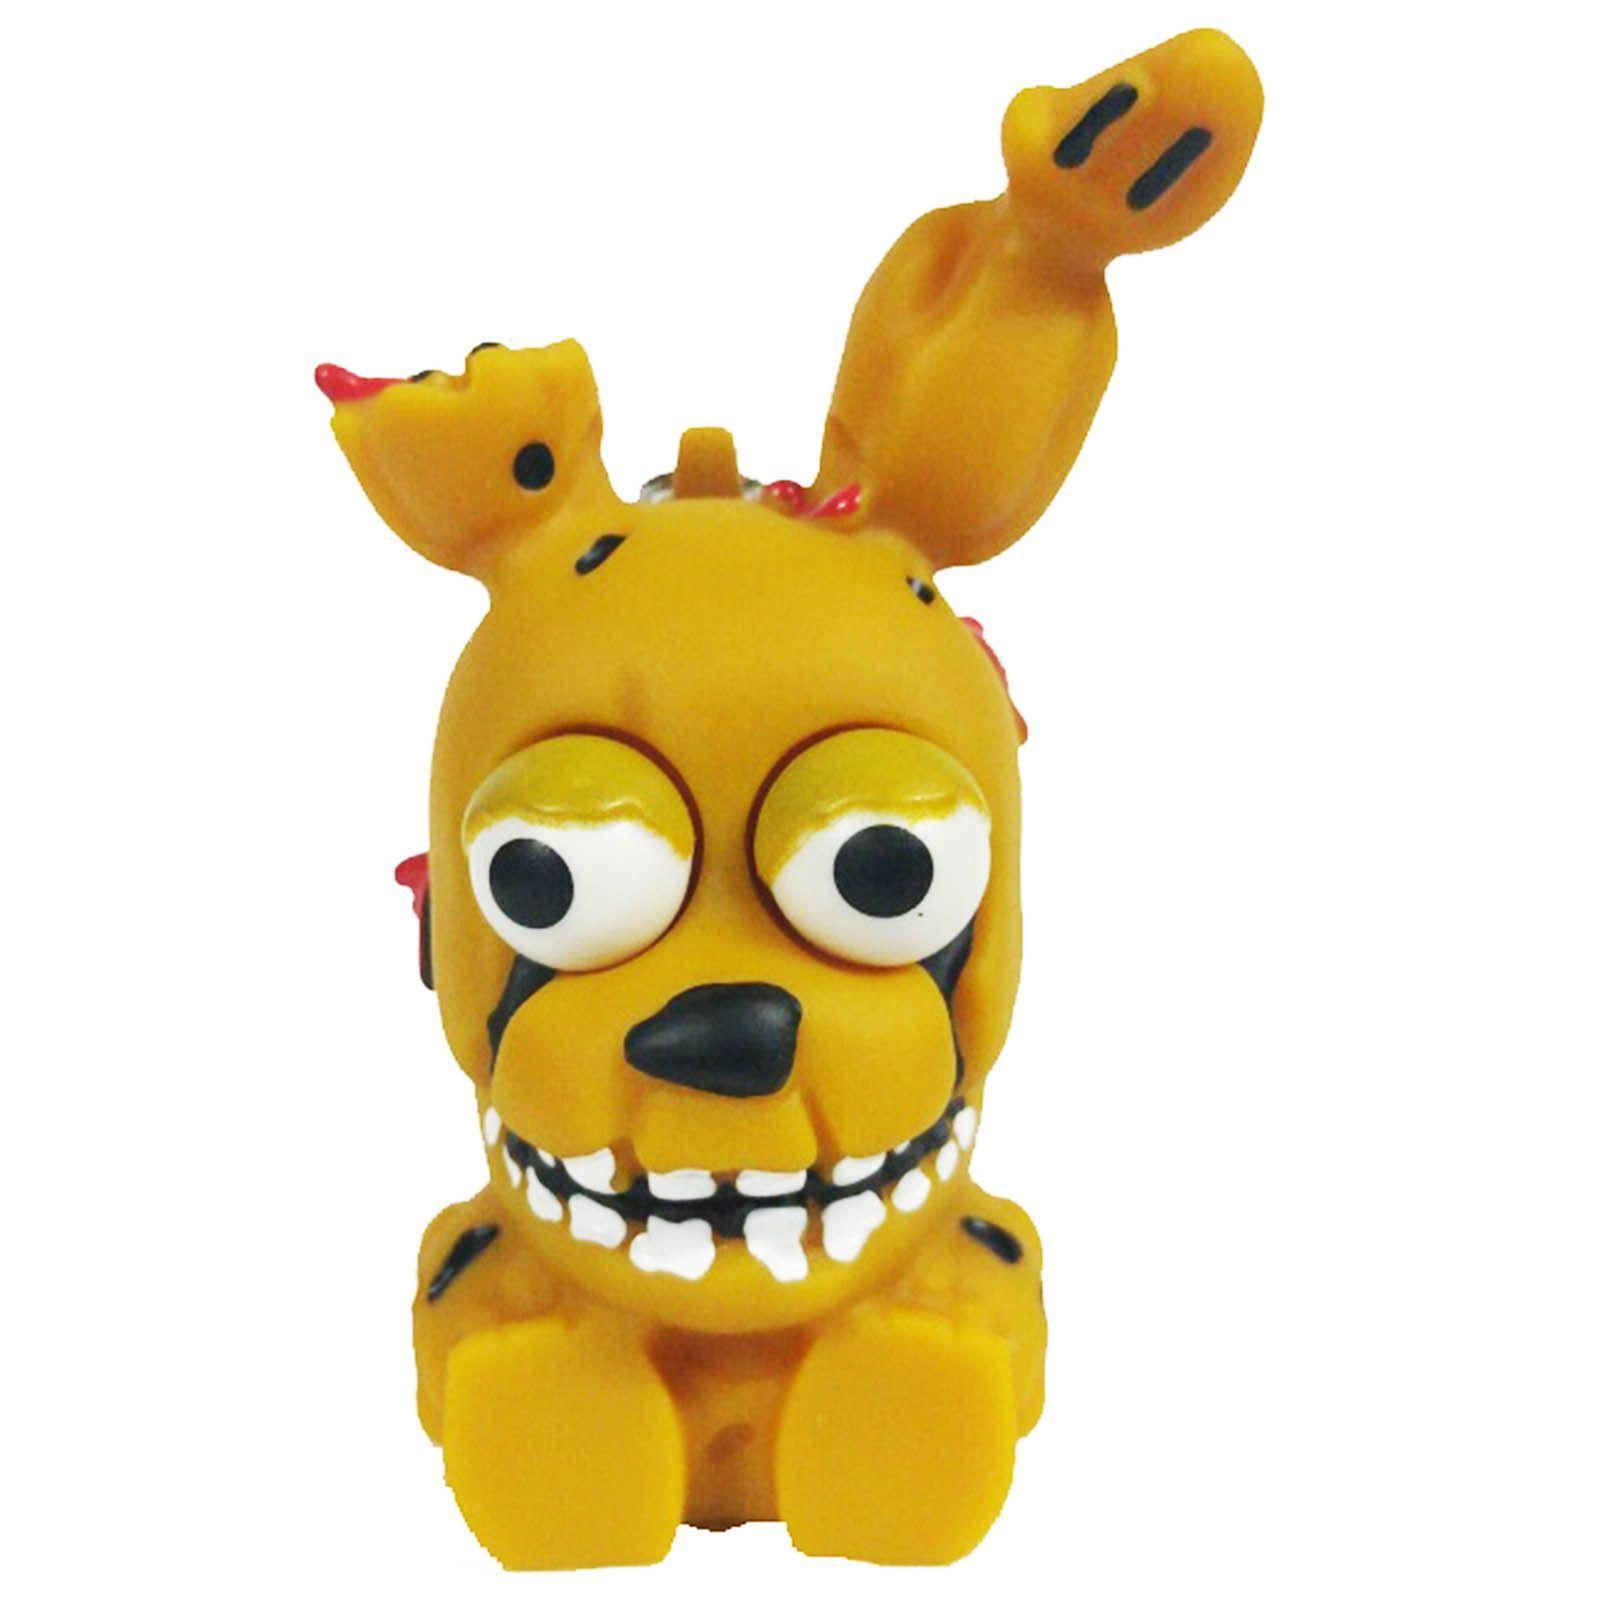 2017 05 freddy fazbear costume amazon - Funko Five Nights At Freddy S Springtrap Squeeze Keychain Figure